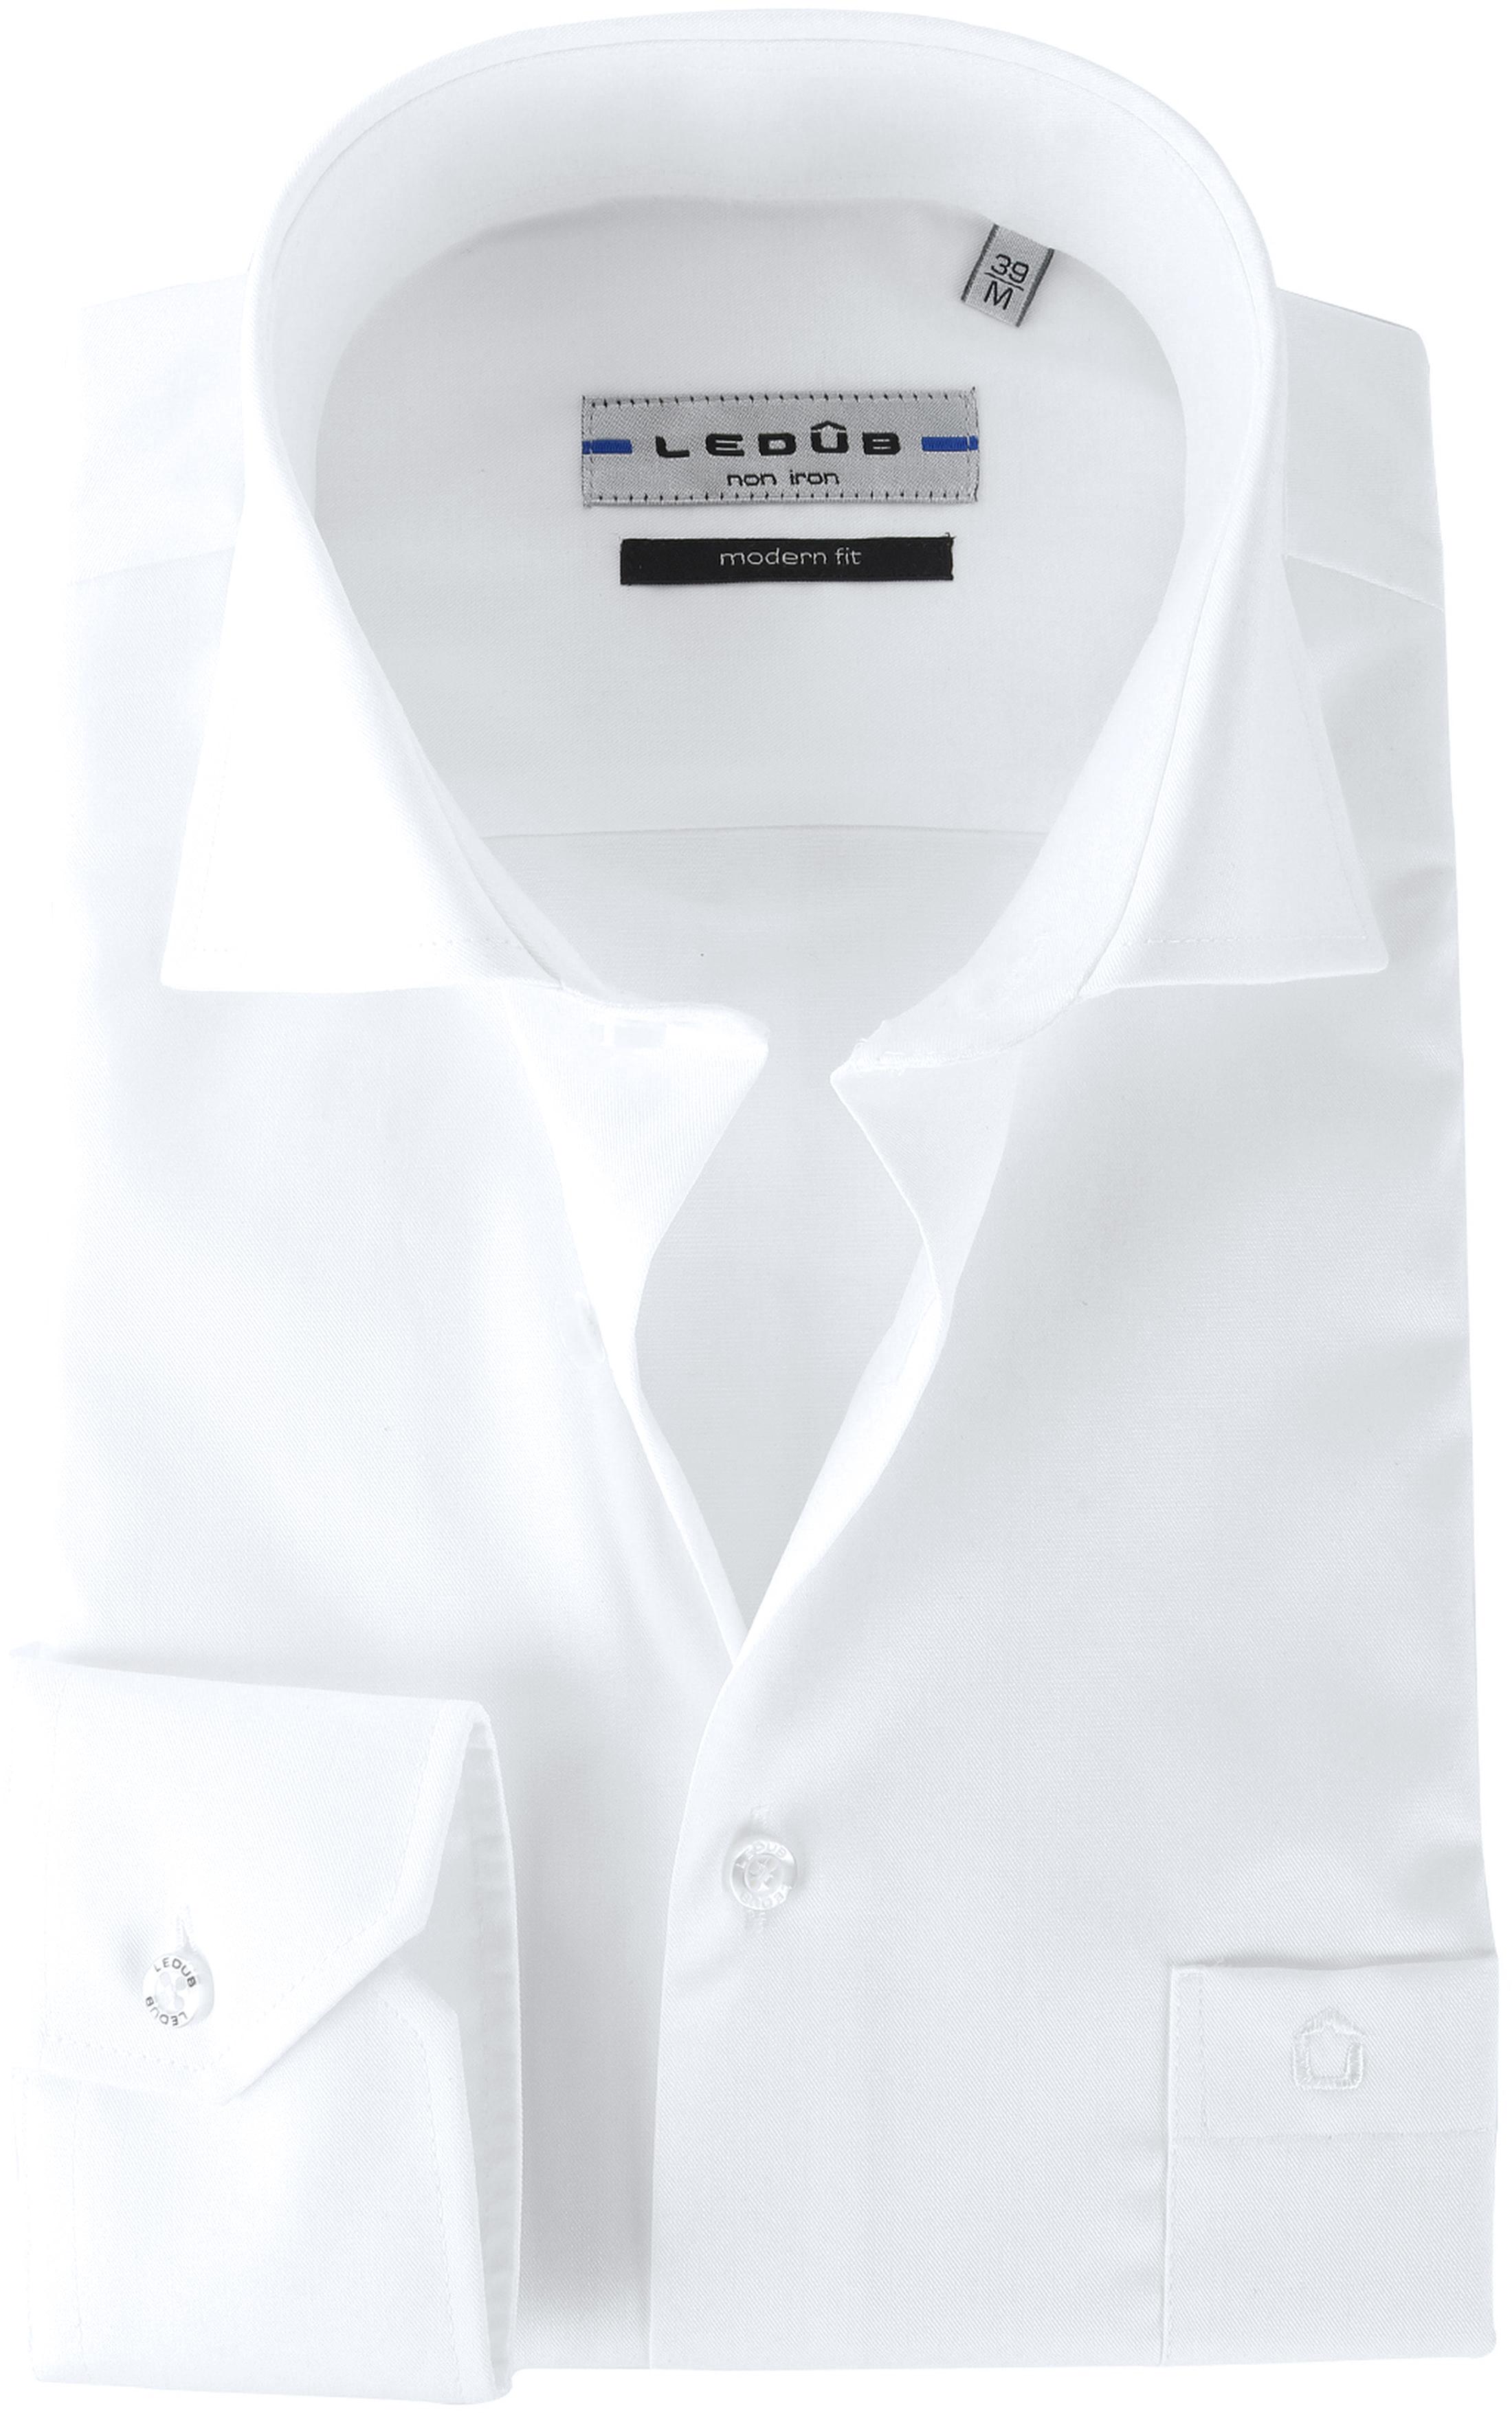 Ledub Overhemd Wit  Non Iron foto 0